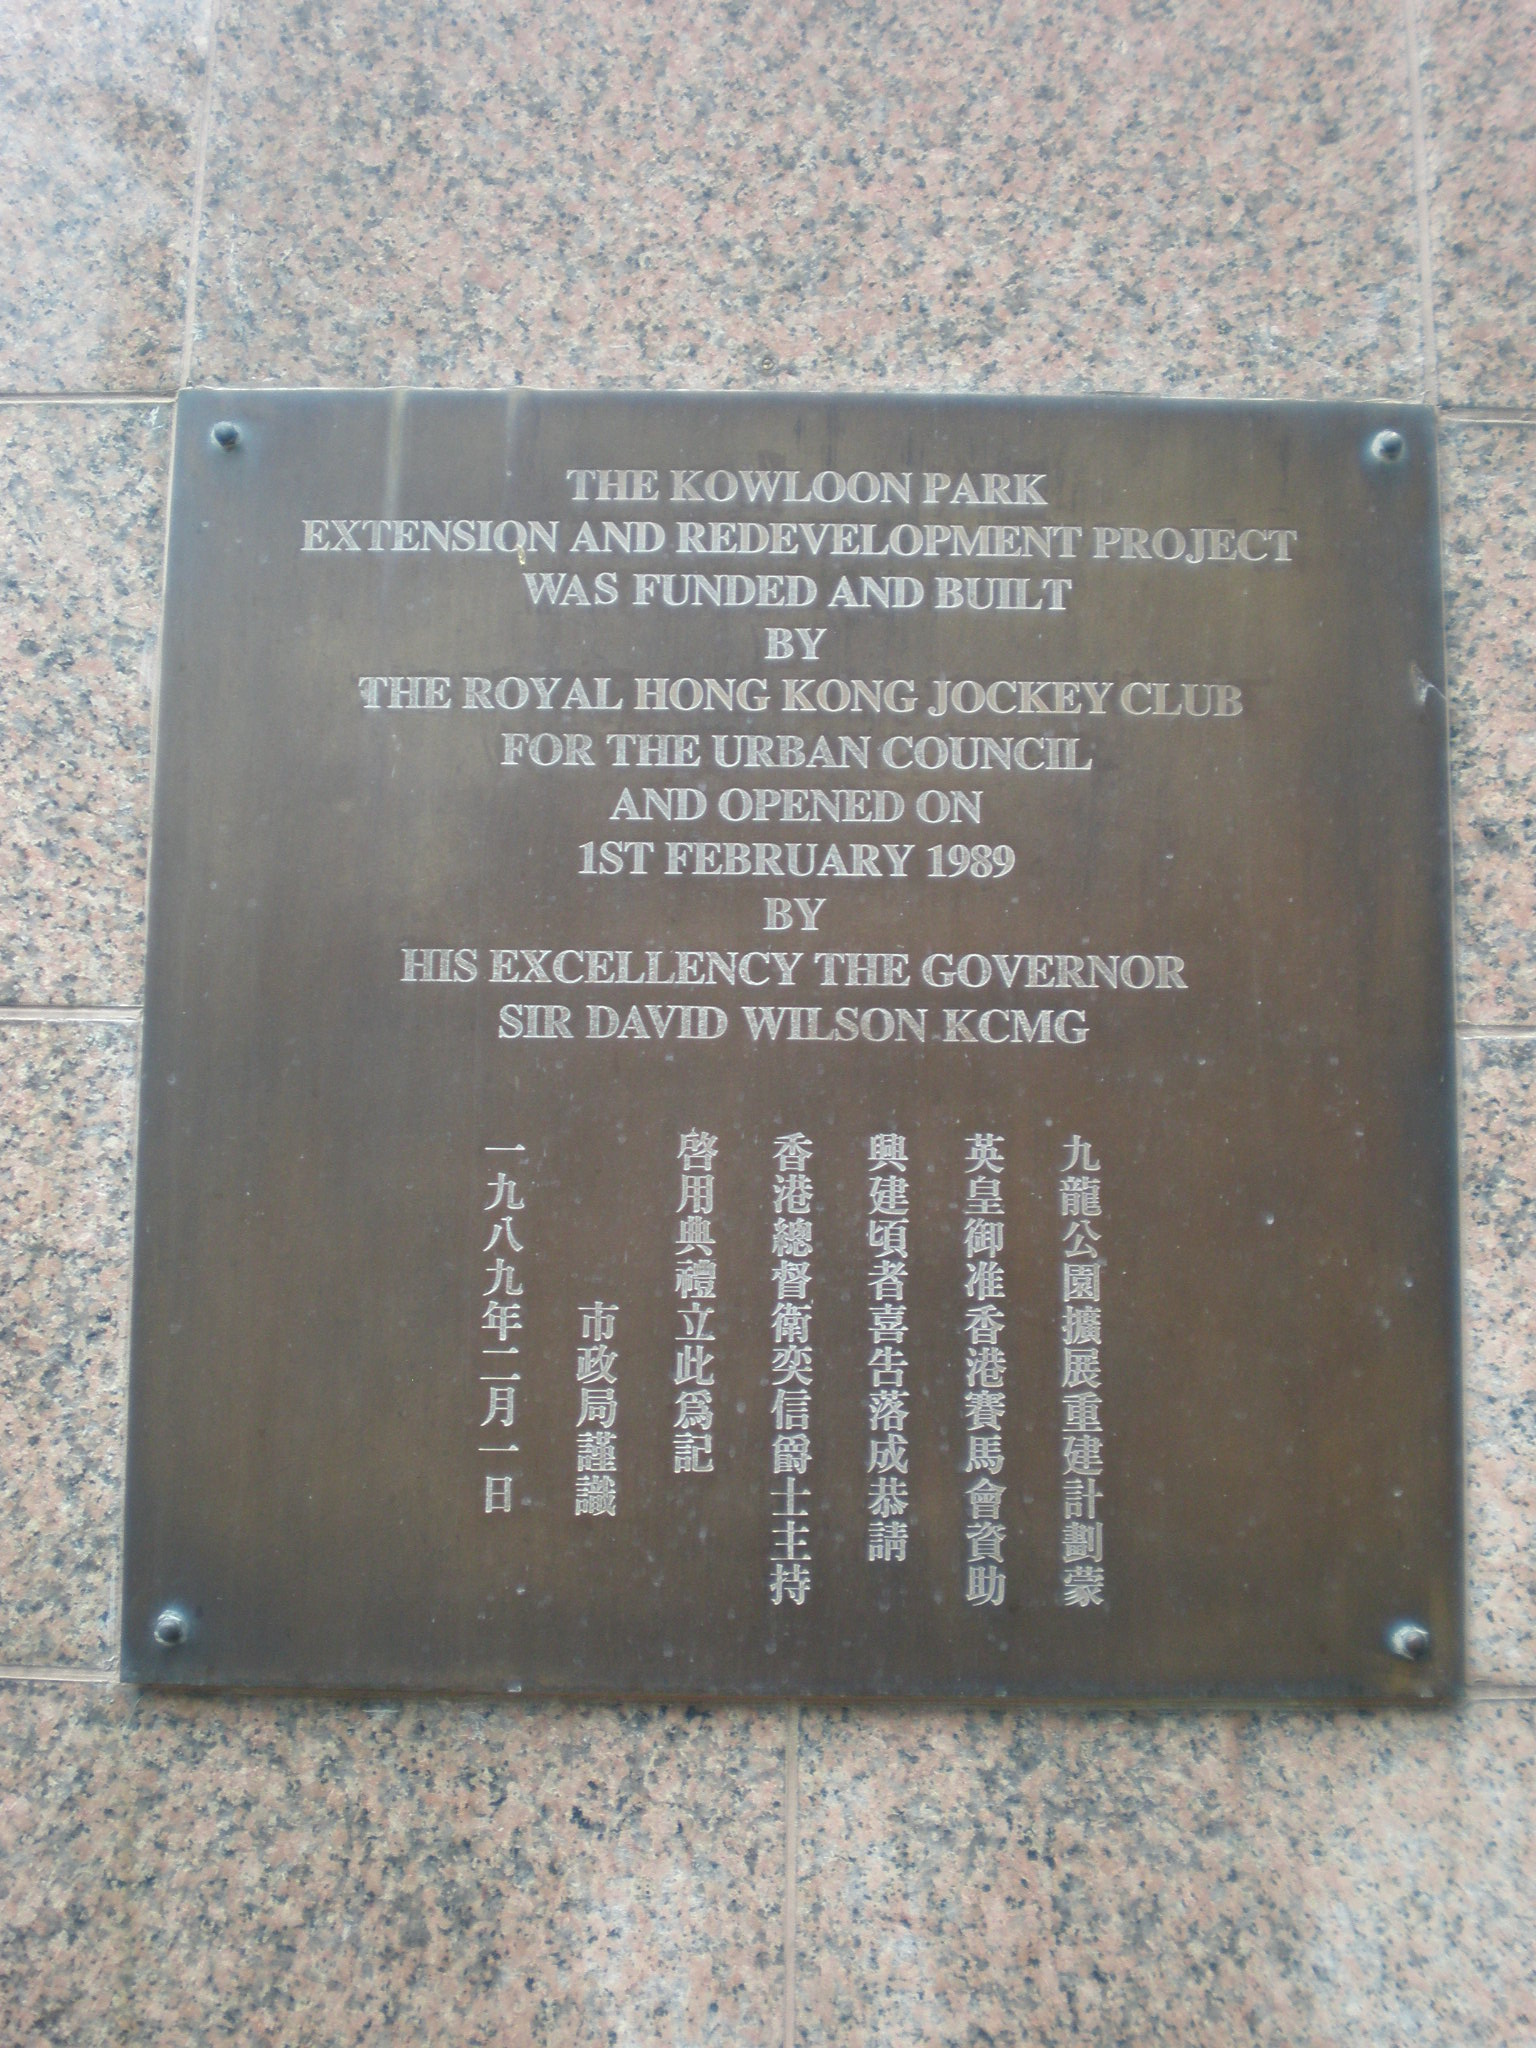 city centercity of pleasantvillenew jersey redevelopment area